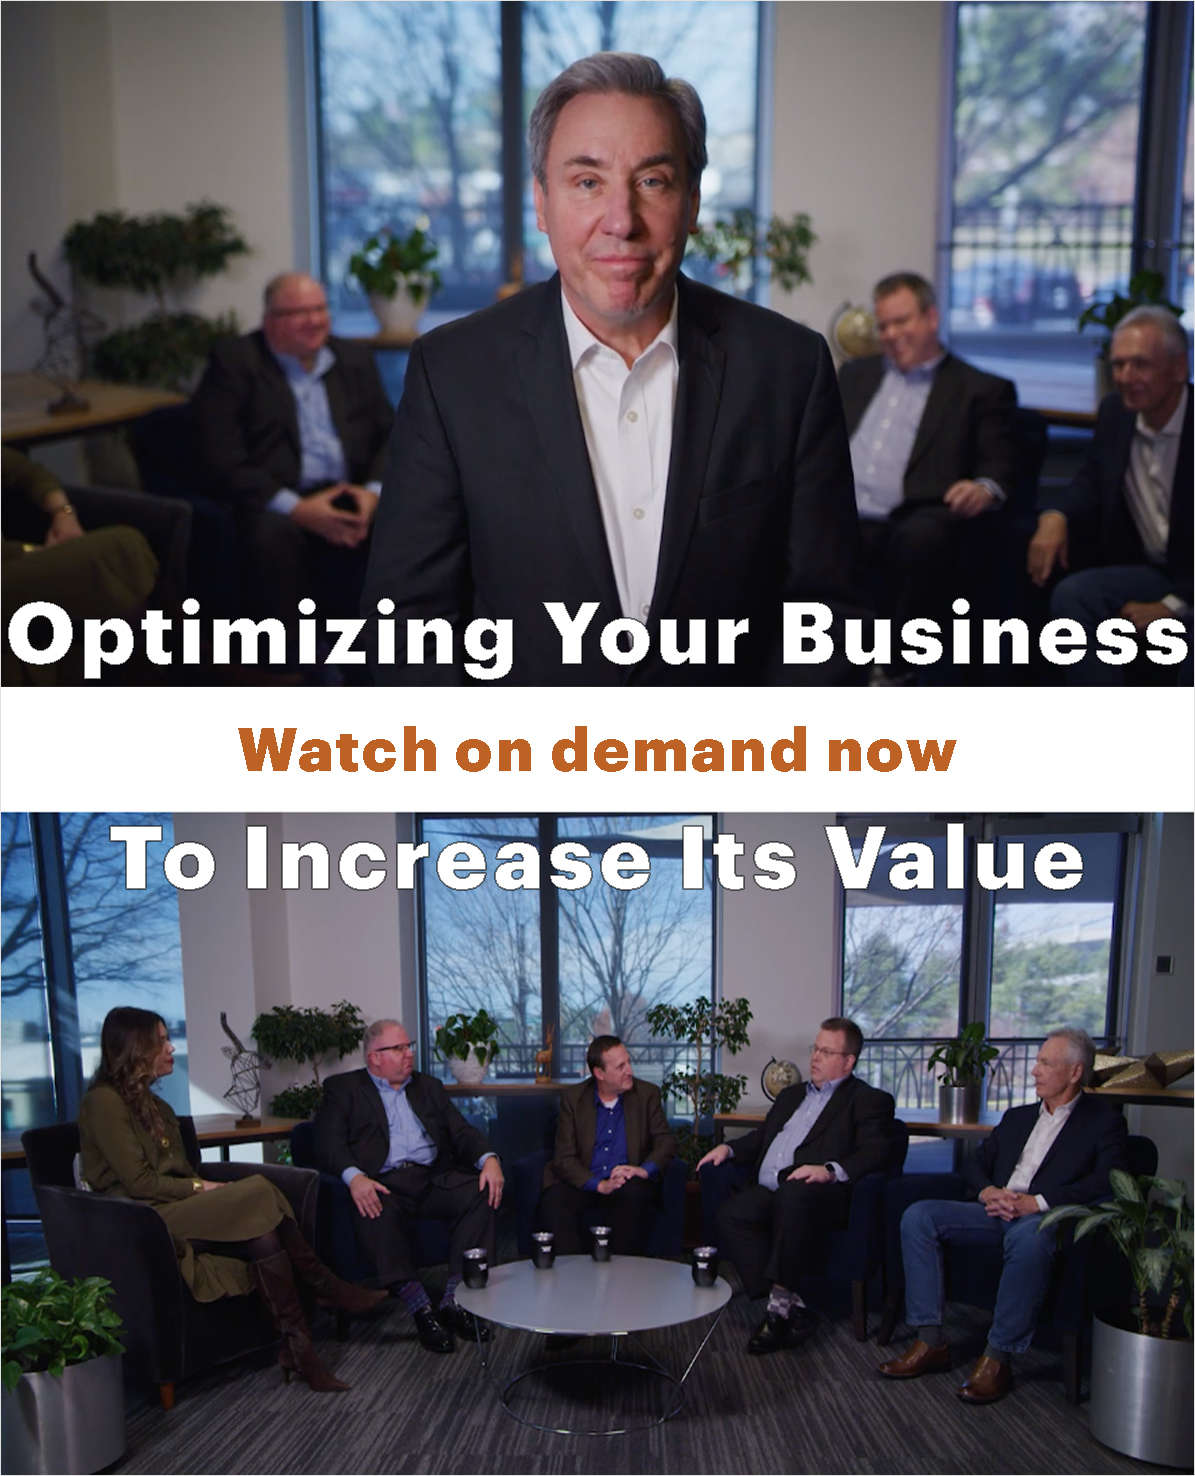 Optimize Your Business Through Process Improvement